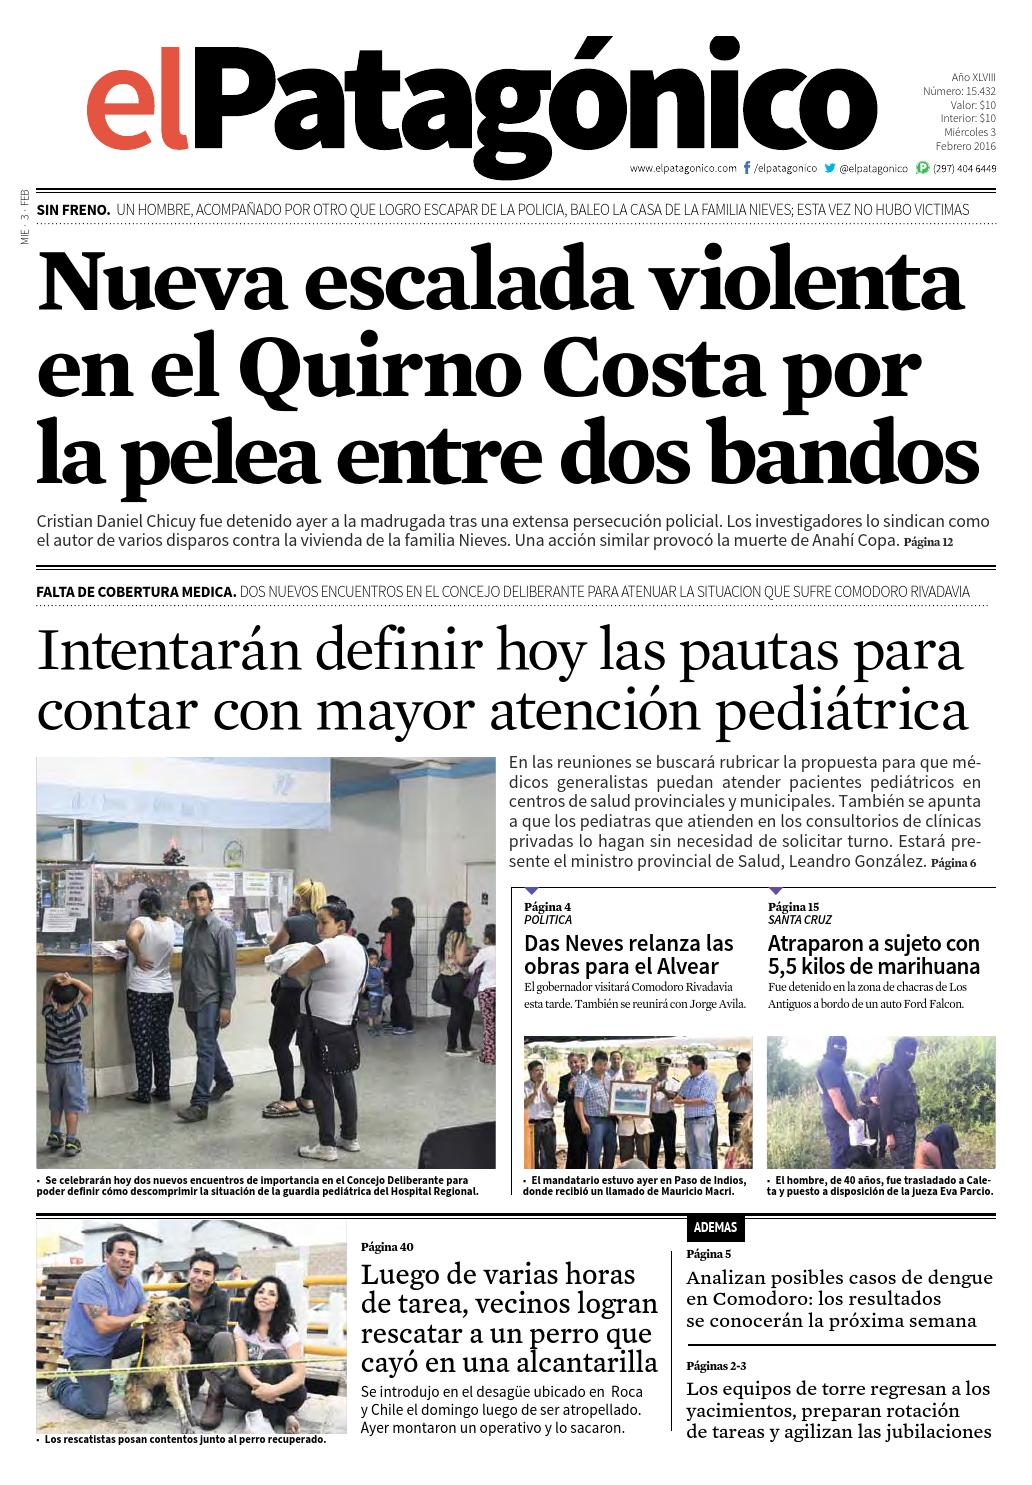 edicion200703022016.pdf by El Patagonico - issuu